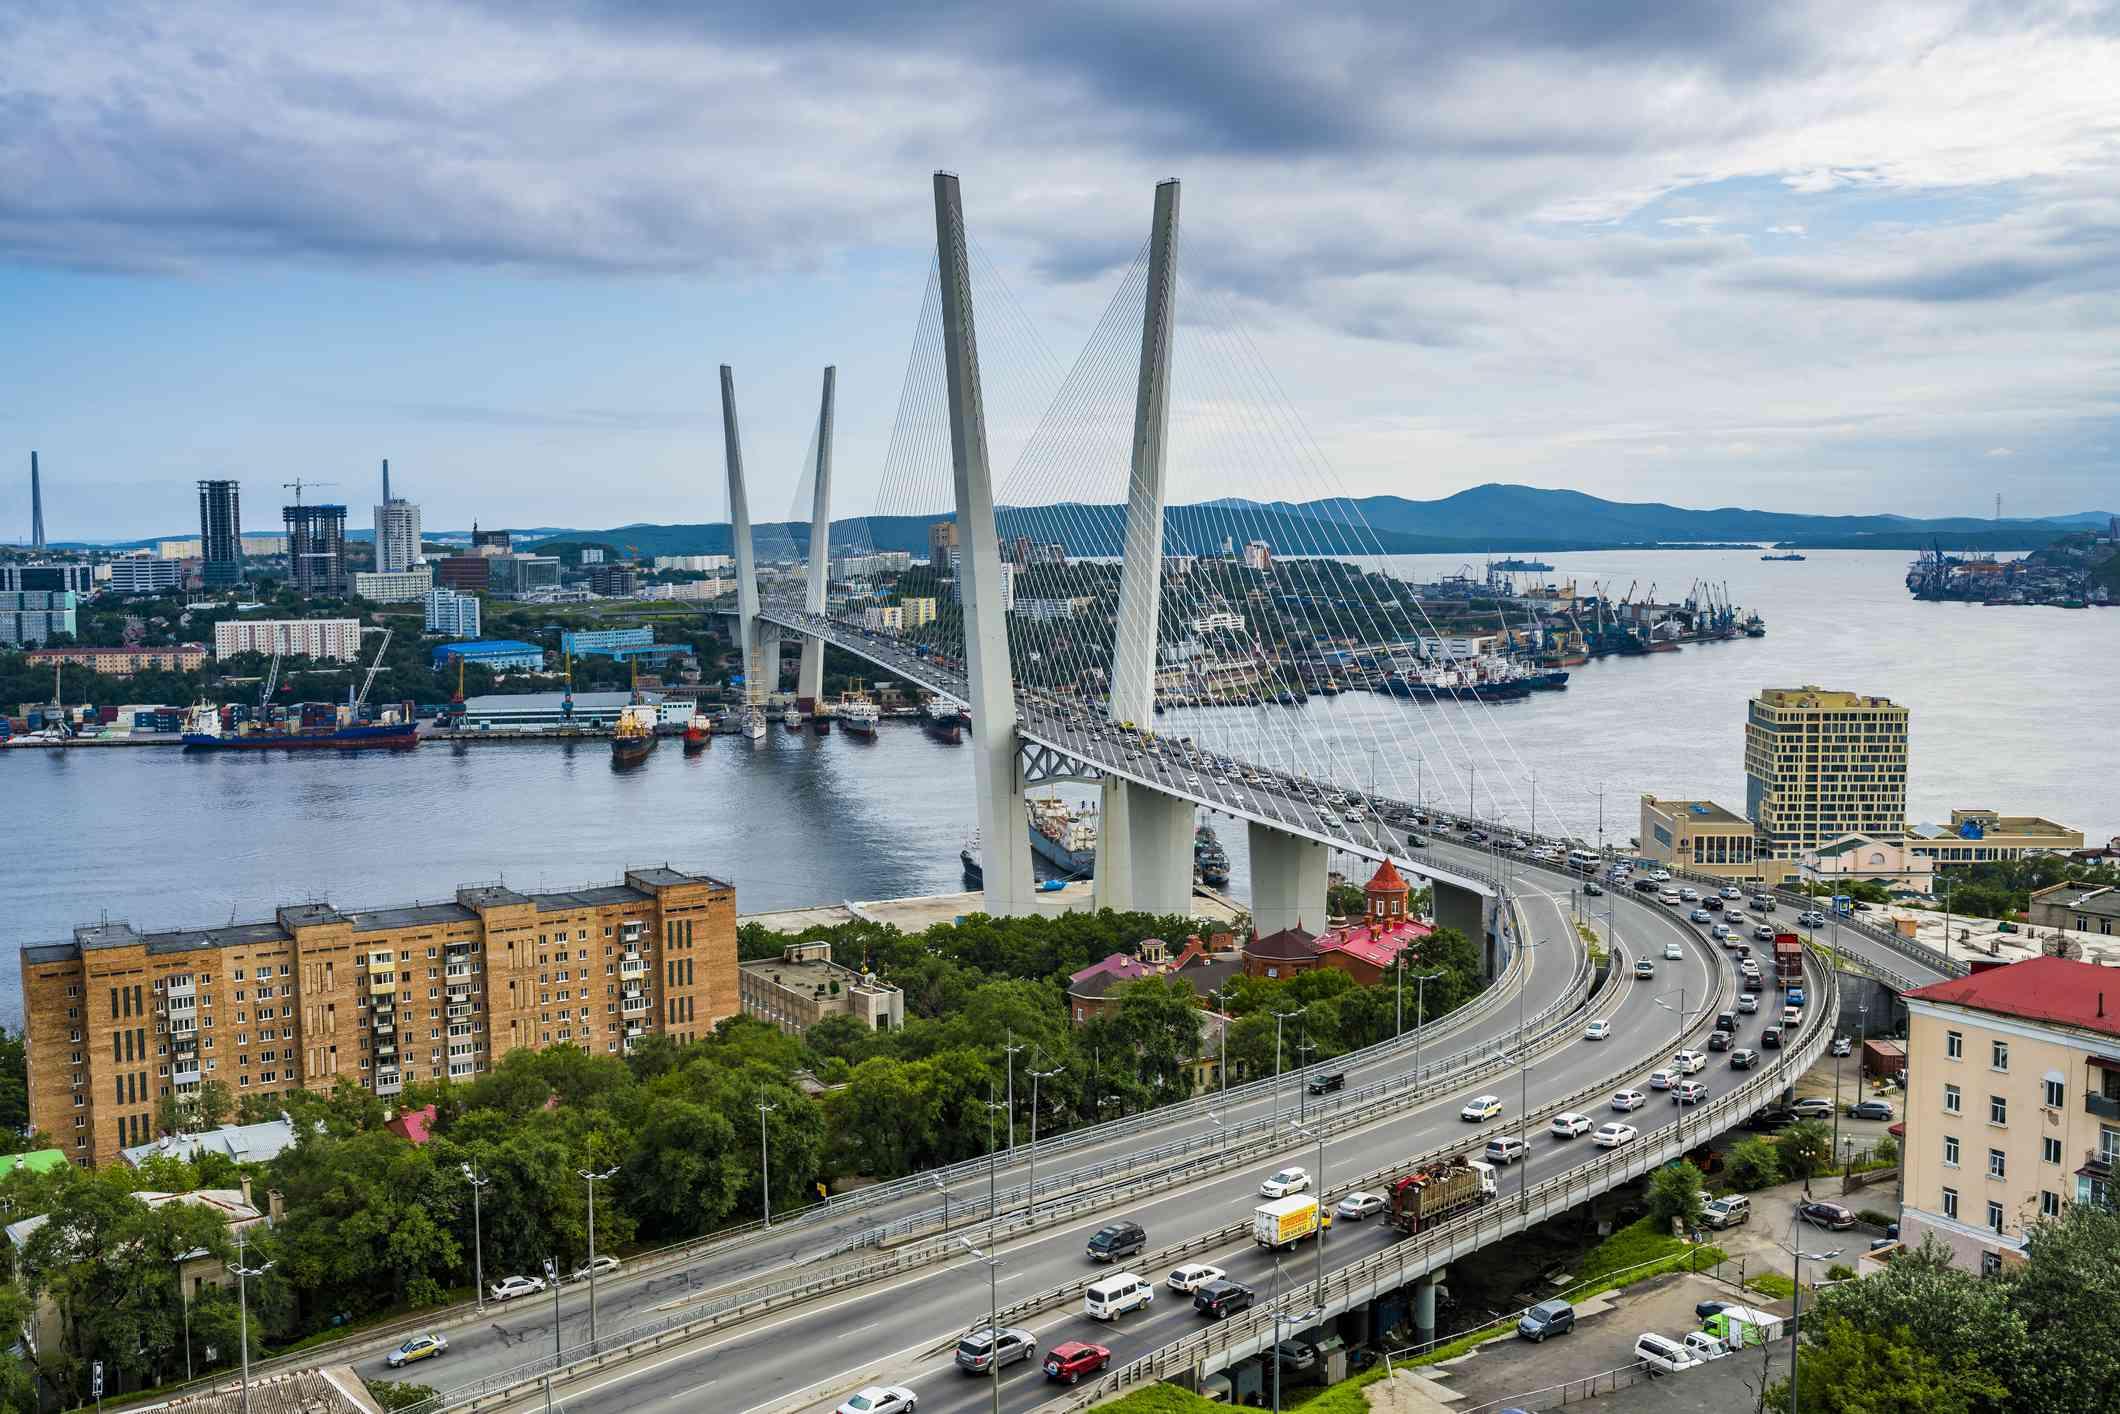 Overlook over Vladivostok and the new Zolotoy Bridge from Eagle's Nest Mount, Vladivostok, Russia